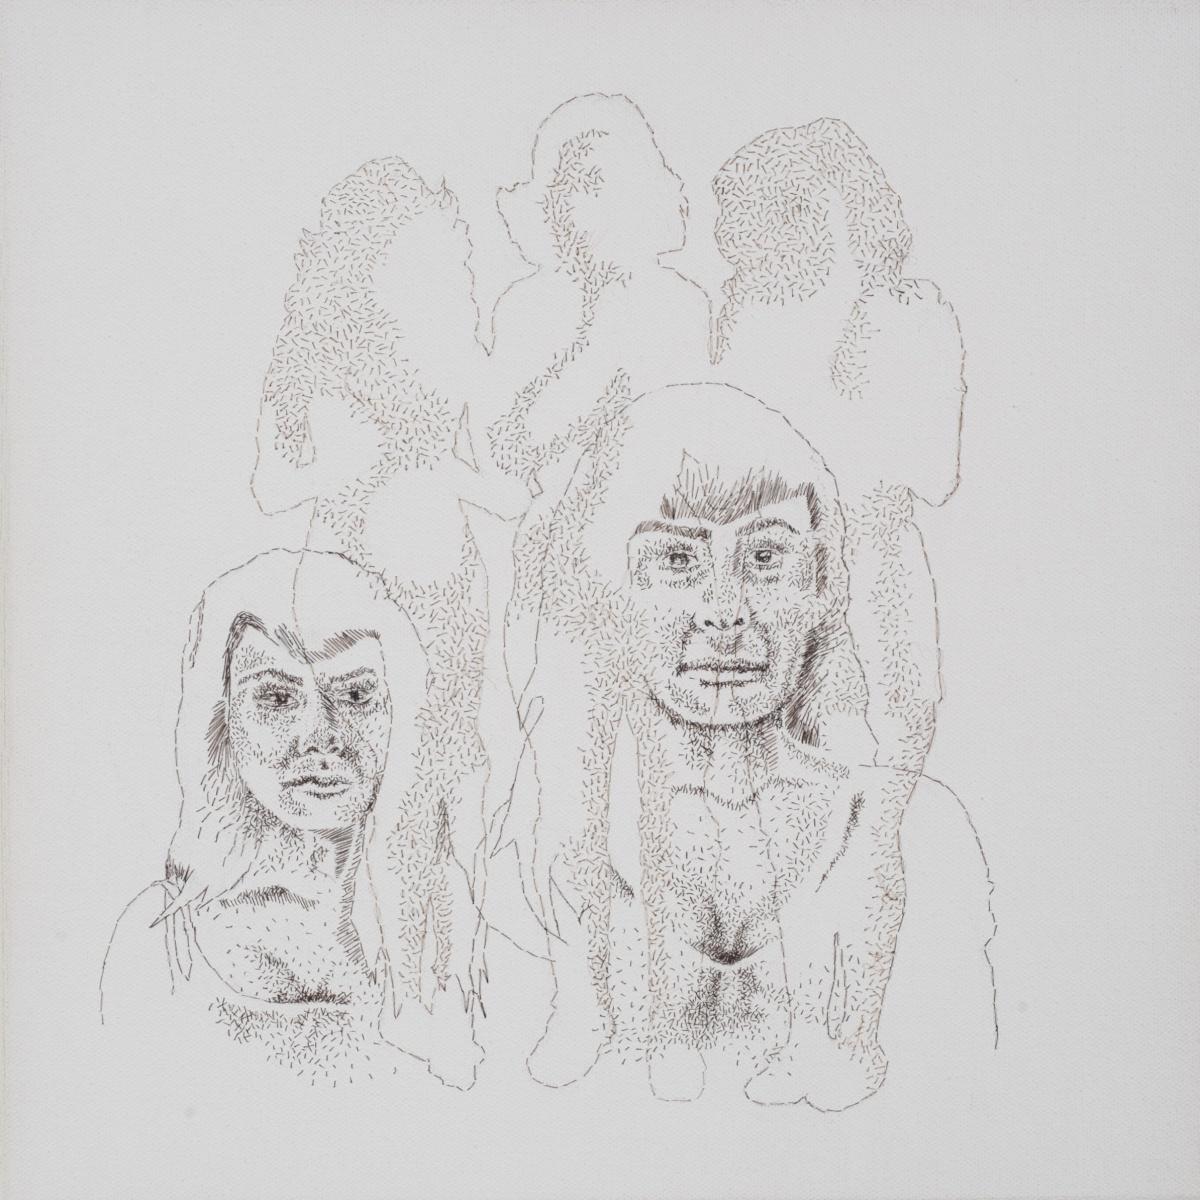 "Jiggle, Jiggle, Jiggle, Jiggle, 2013, hand-sewn human hair on canvas, 13"" x 13"""